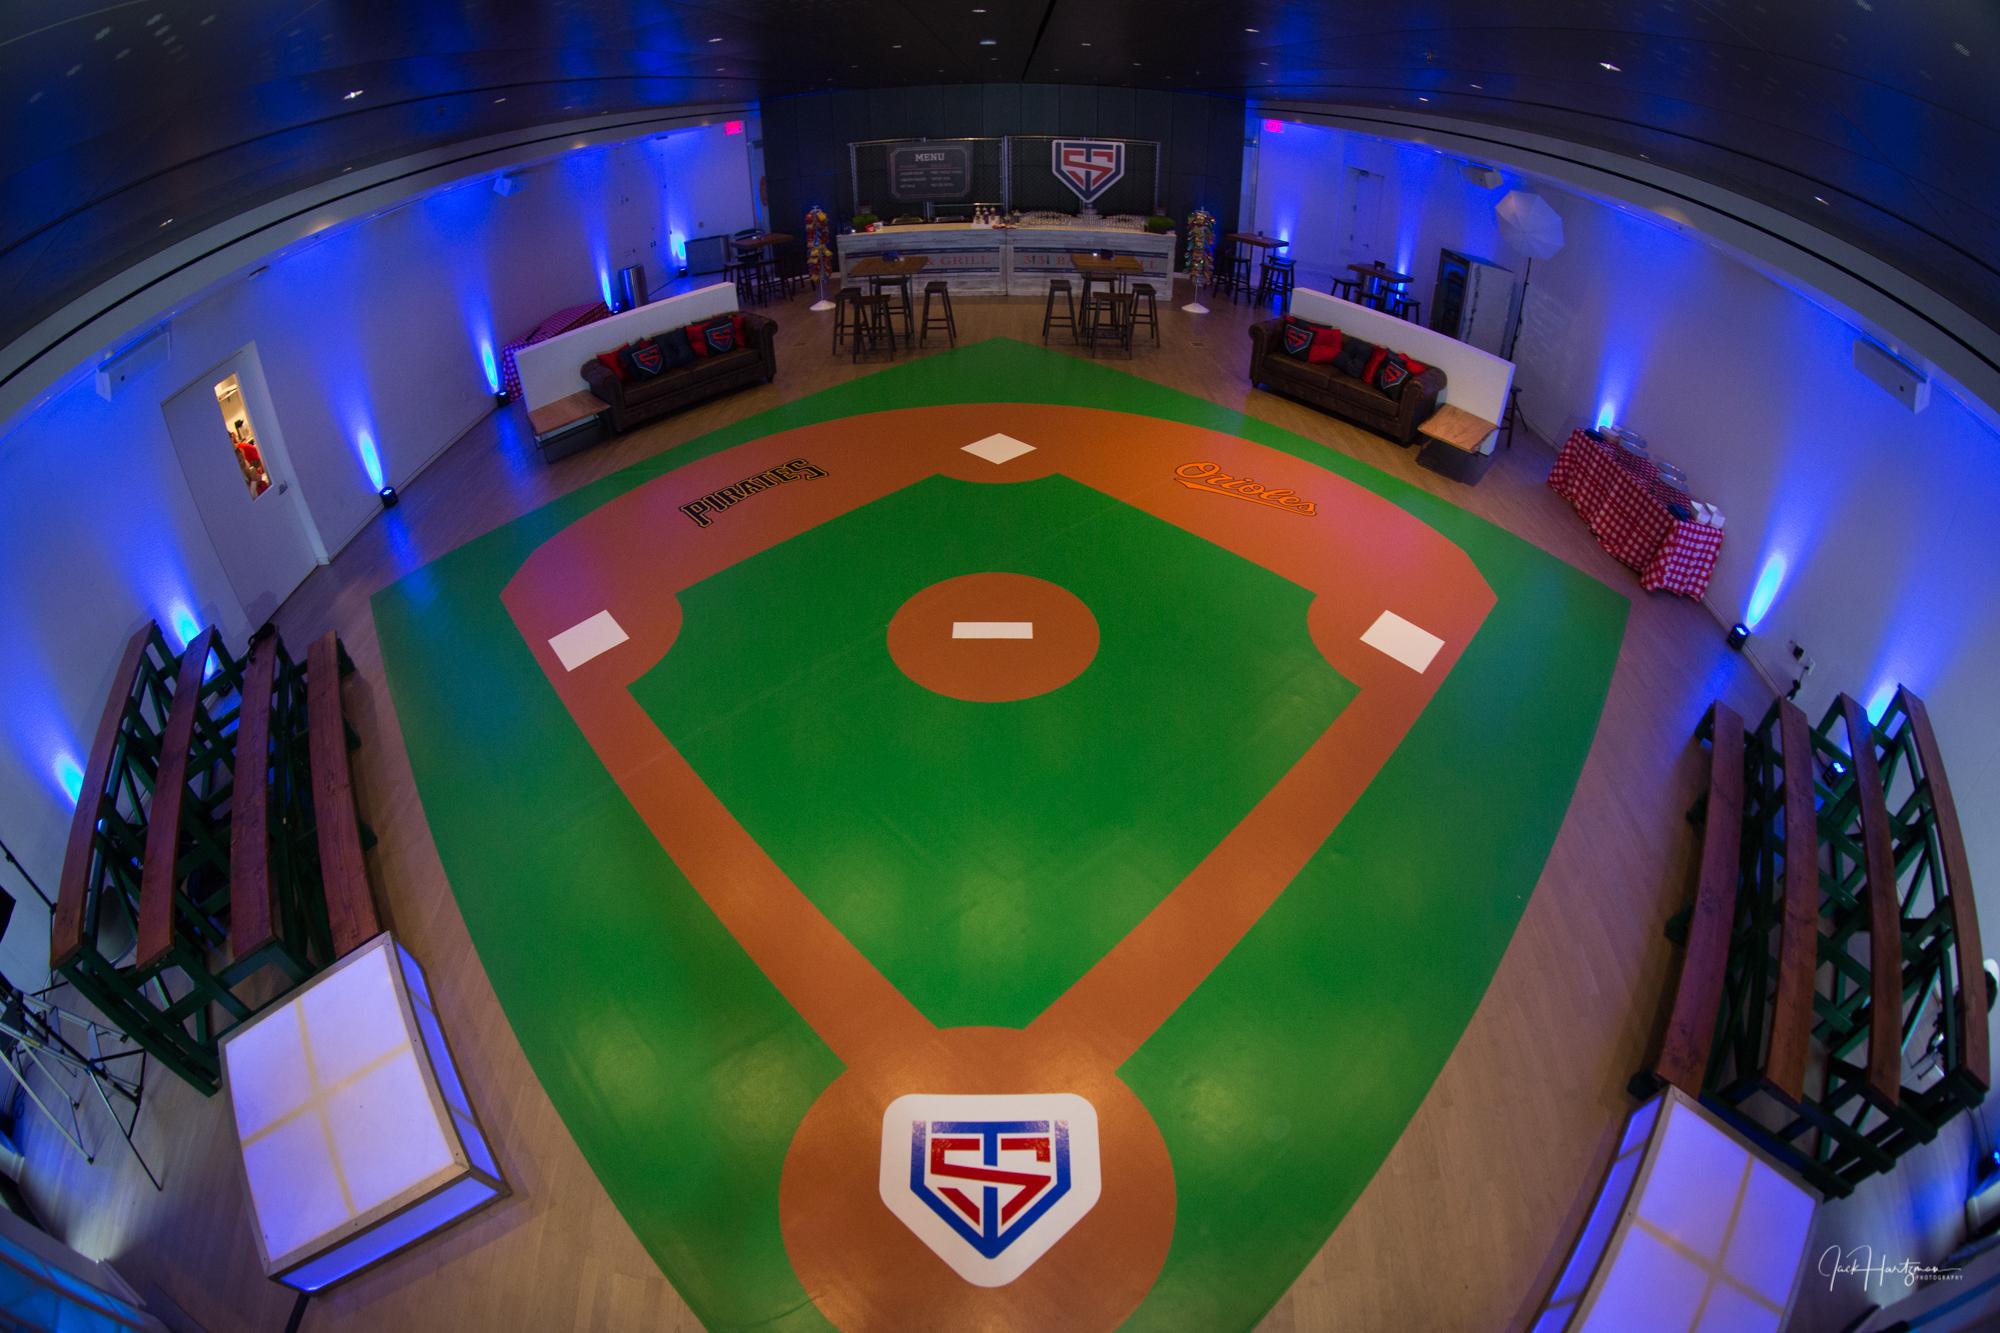 Ballpark to the Ballroom - iSparkleEvents